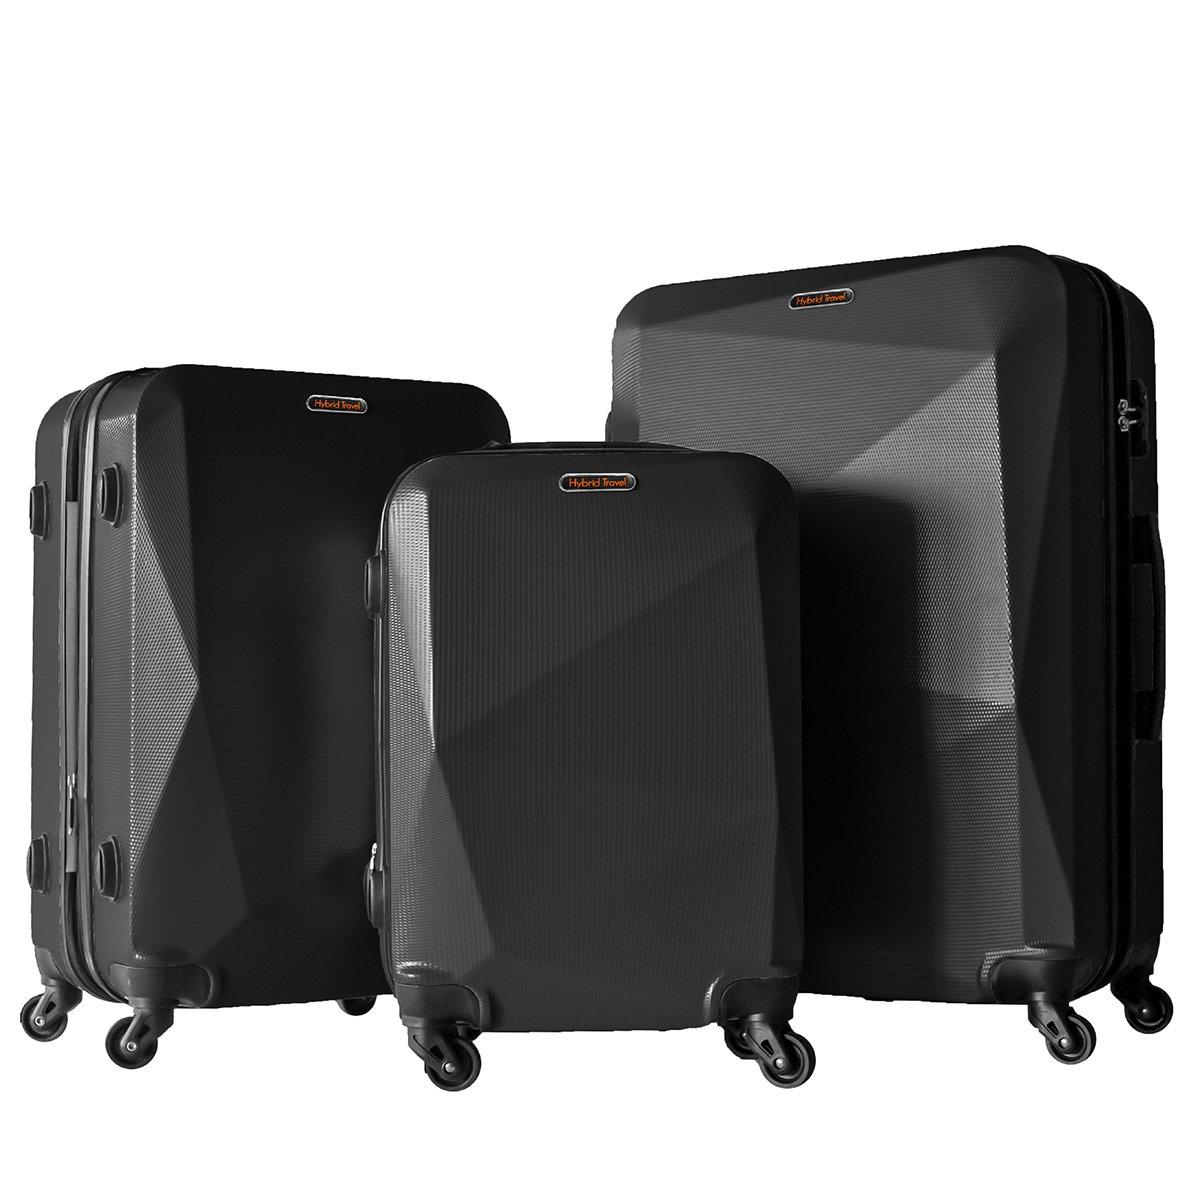 3 PC Luggage Set Durable Lightweight Hard Case Spinner Suitecase LUG3 HD1629 BLACK